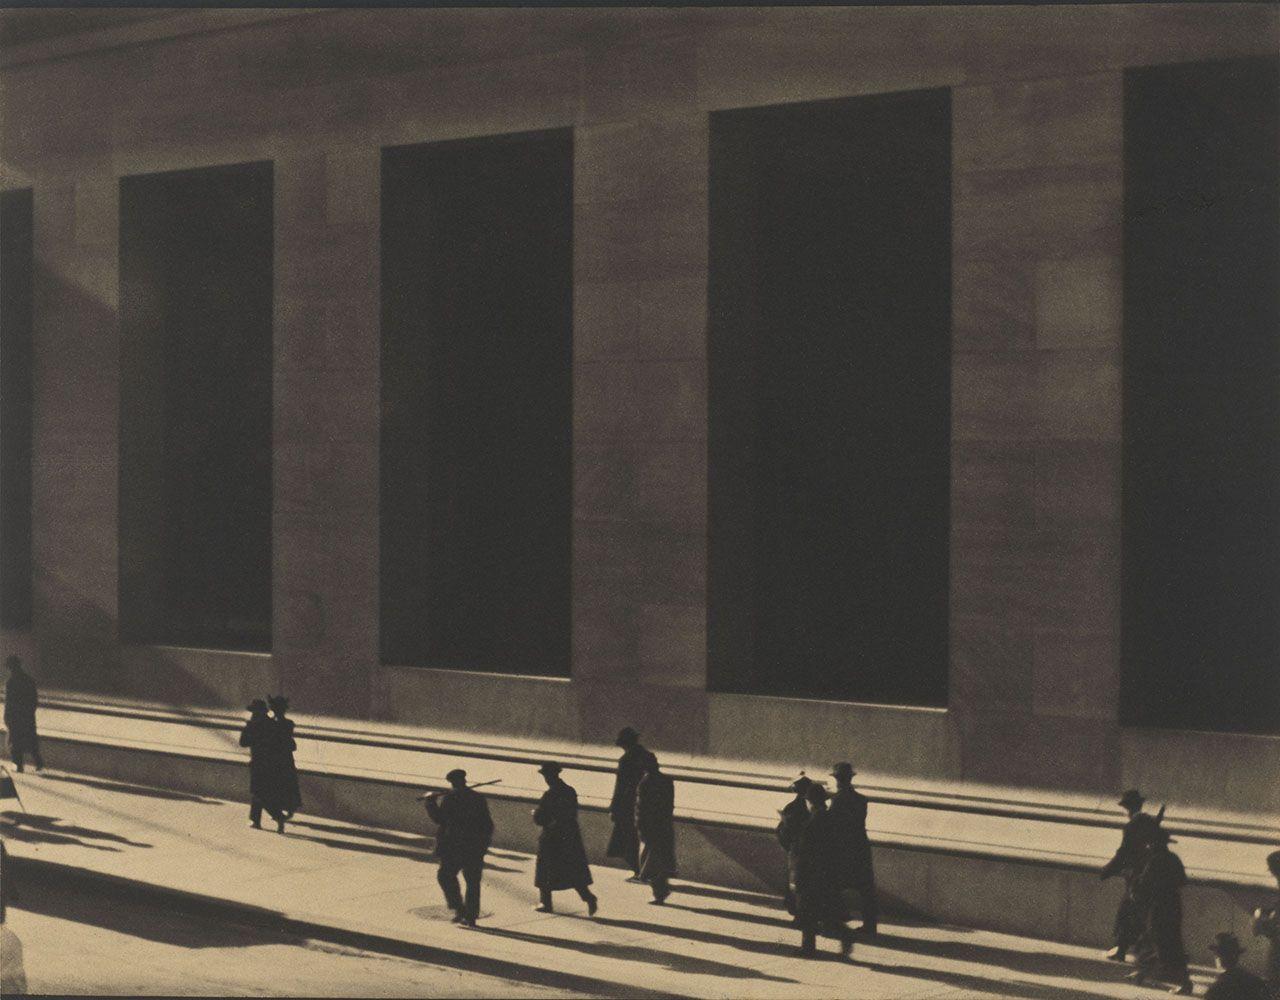 Paul Strand (1890-1976), Wall Street, New York, 1915 © Paul Strand Archive, Aperture Foundation